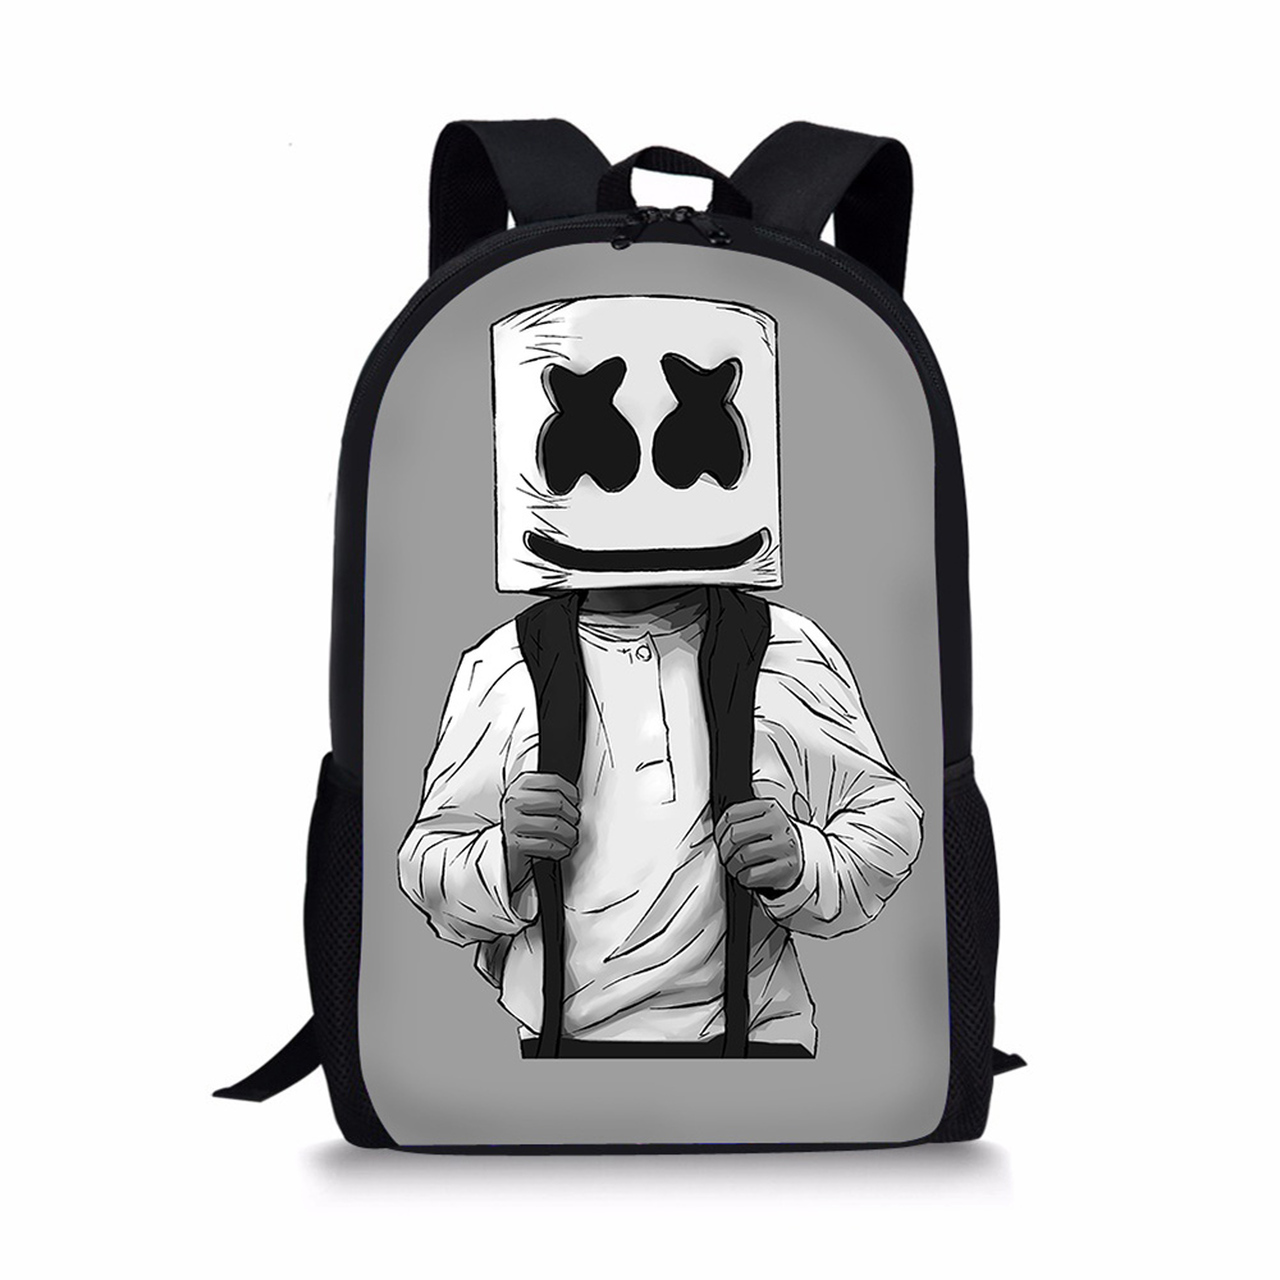 Fashion School Bags Kids Shoulder Backpack Back to School